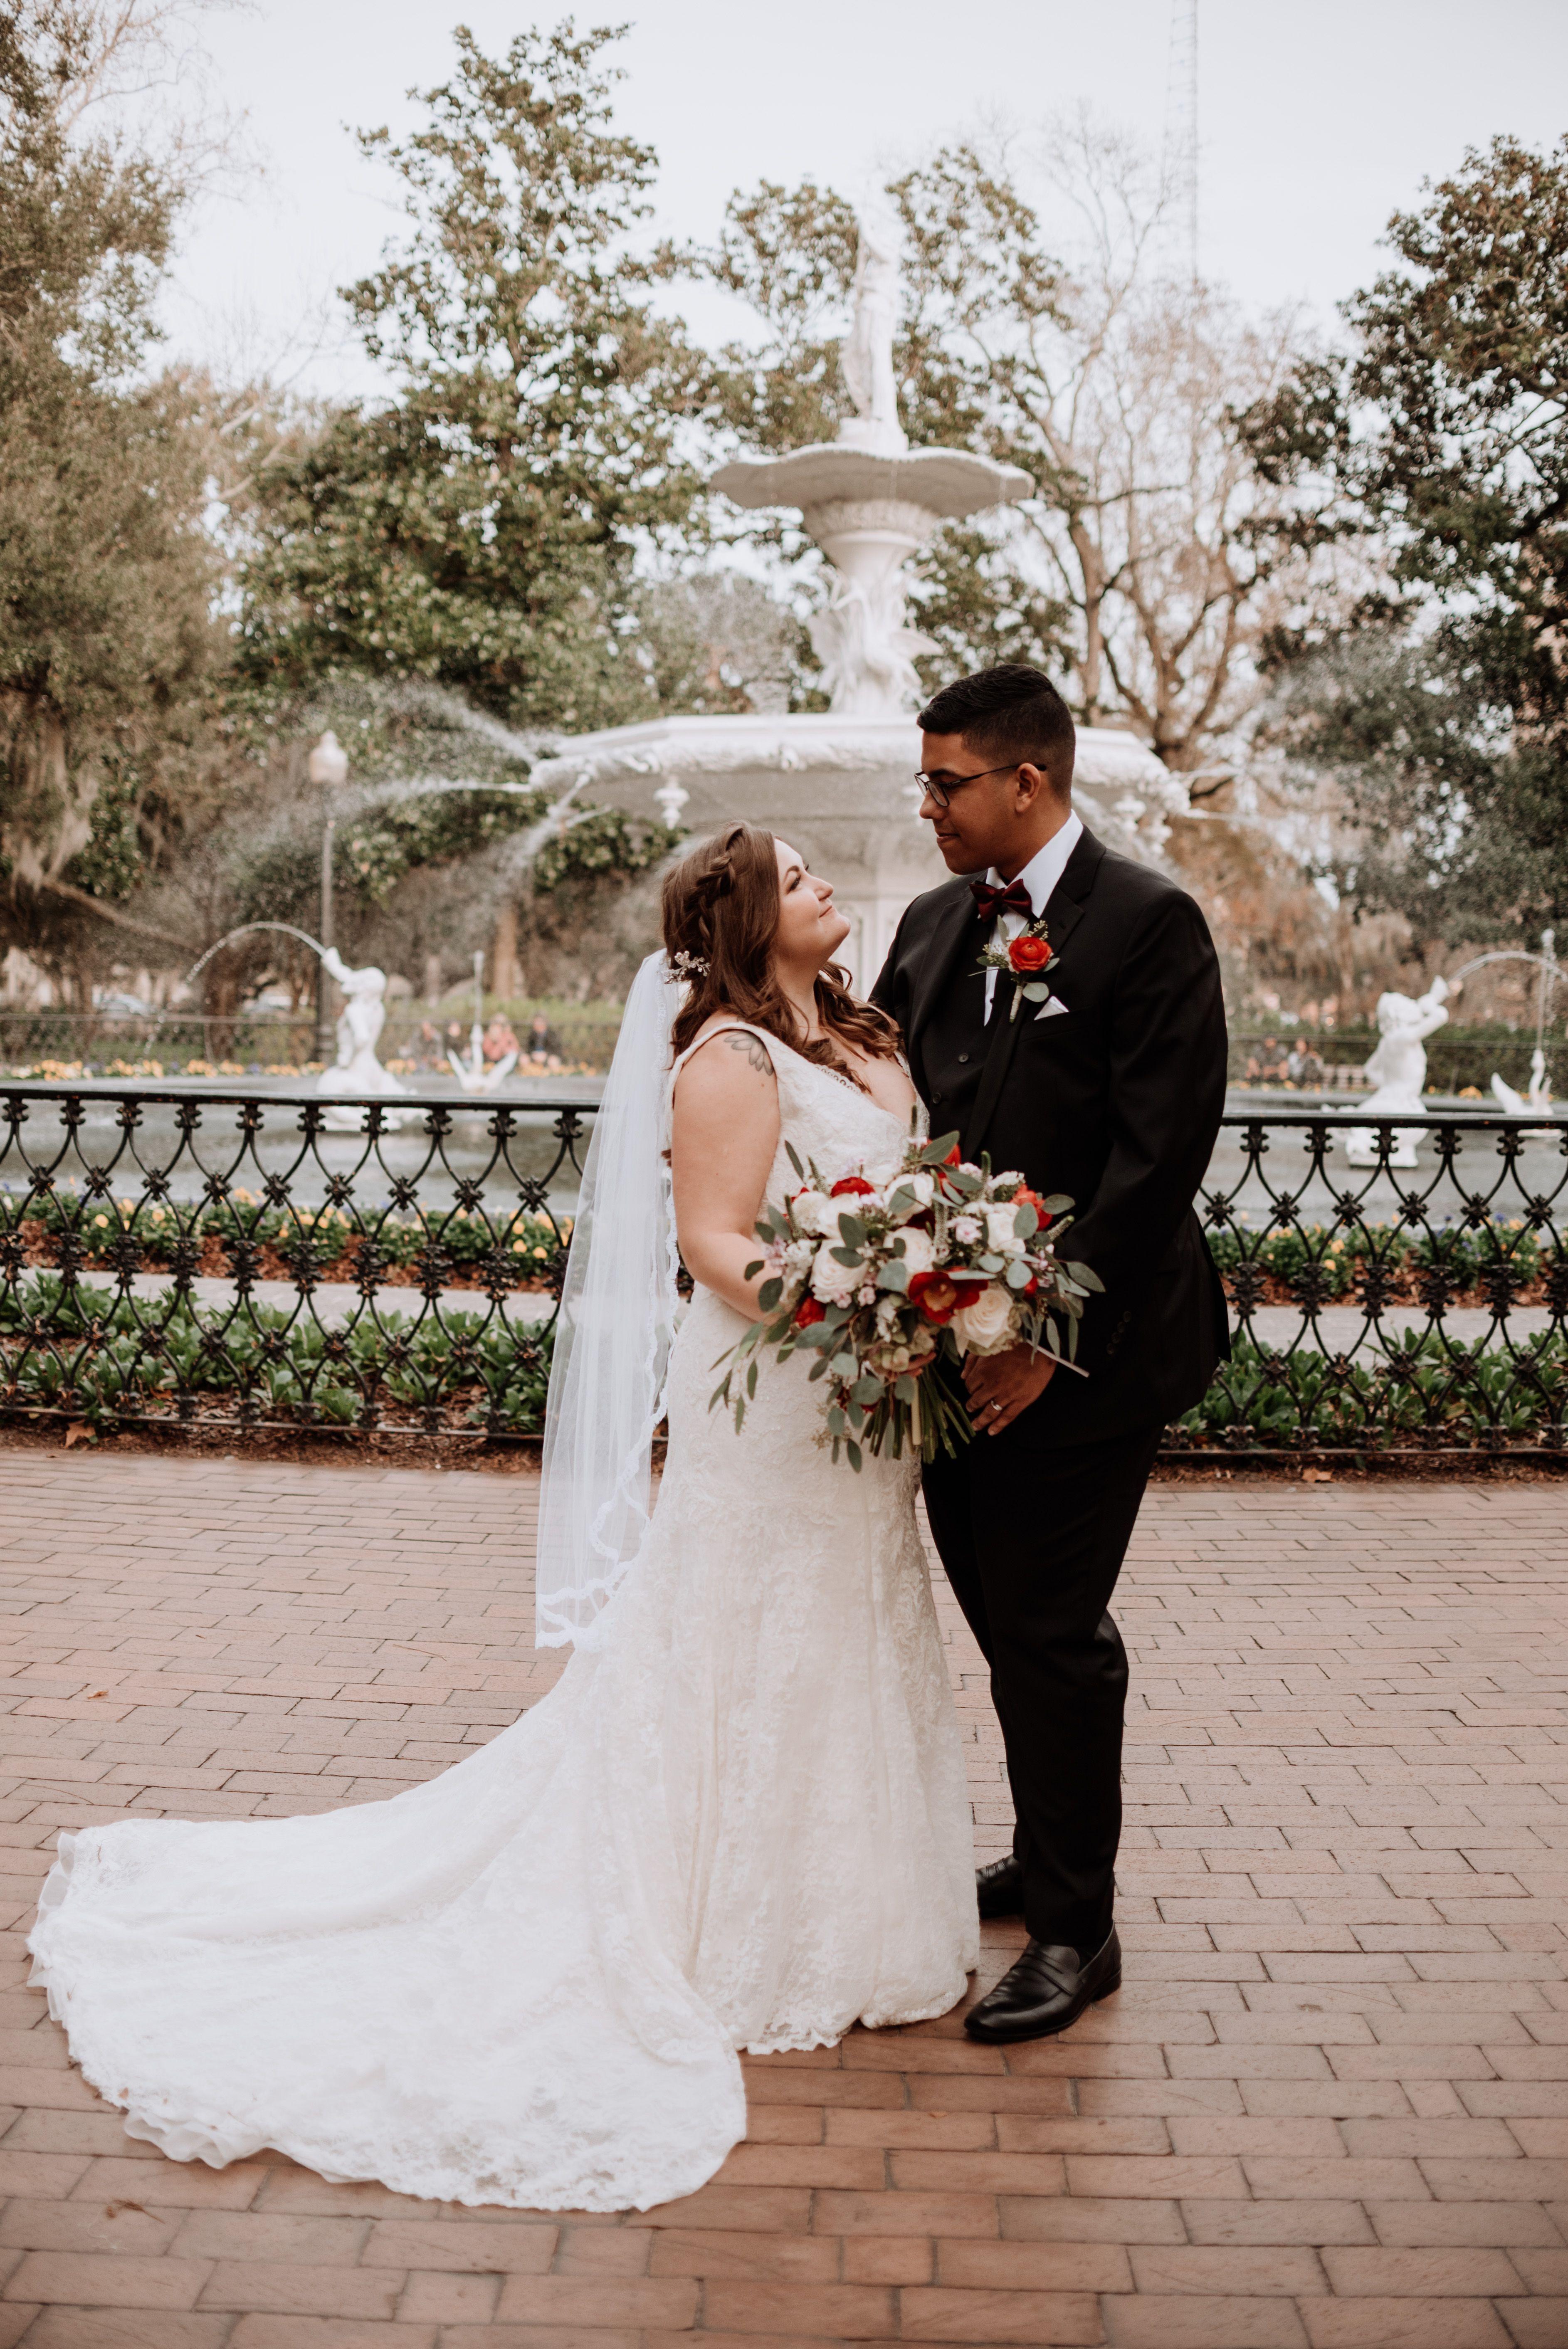 Elope in savannah the 2021 guide to savannah elopement